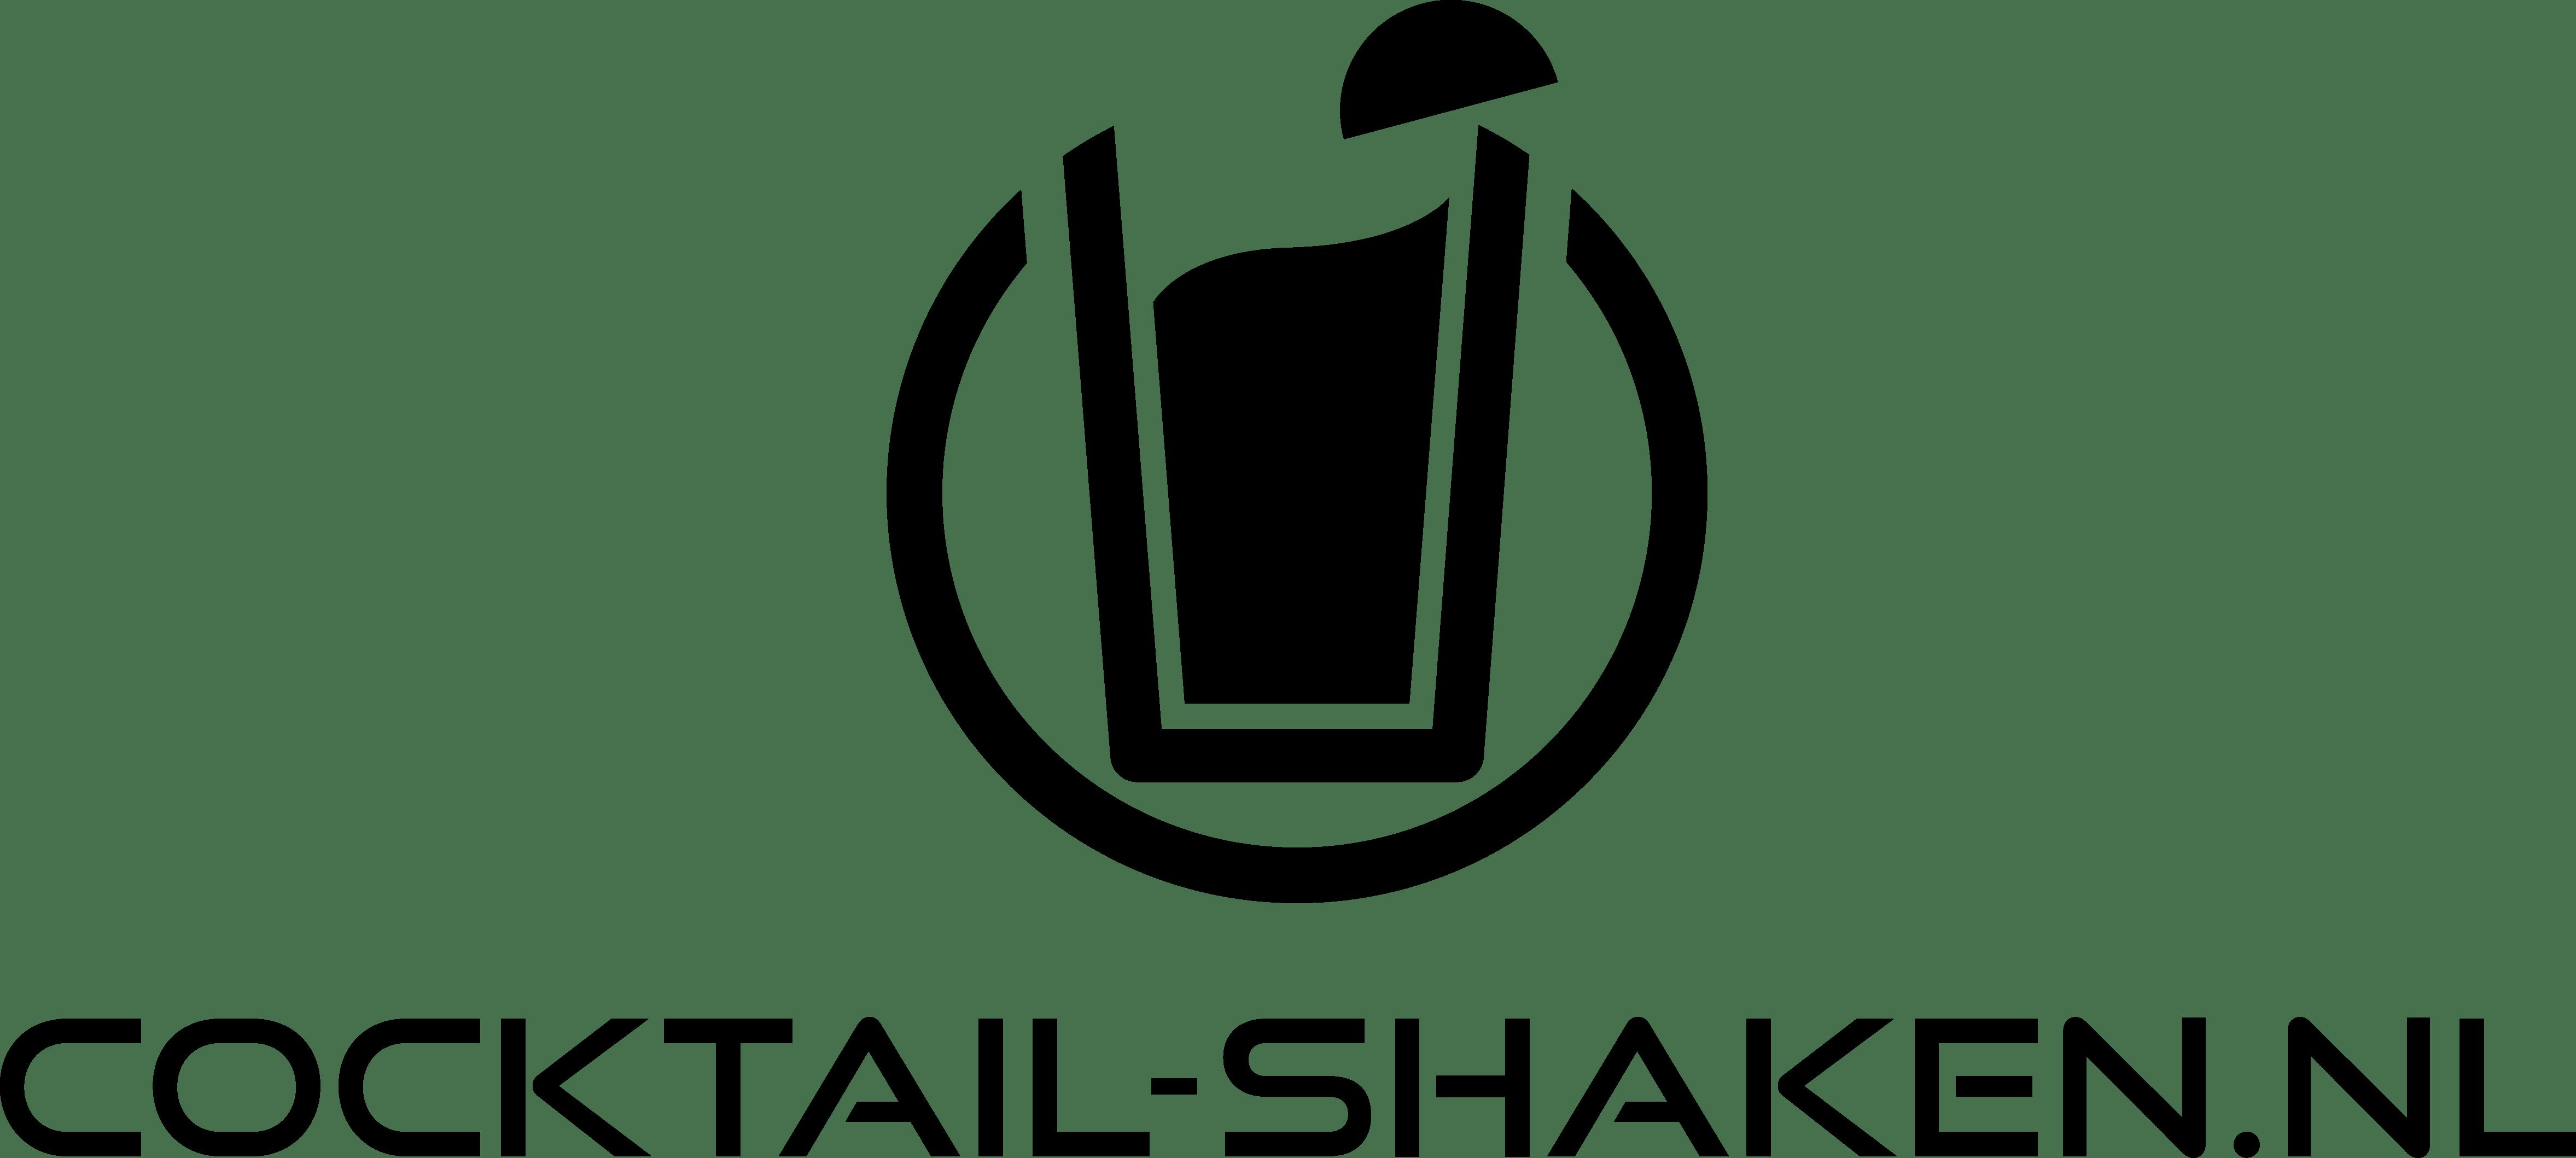 cocktail-shaken.nl logo